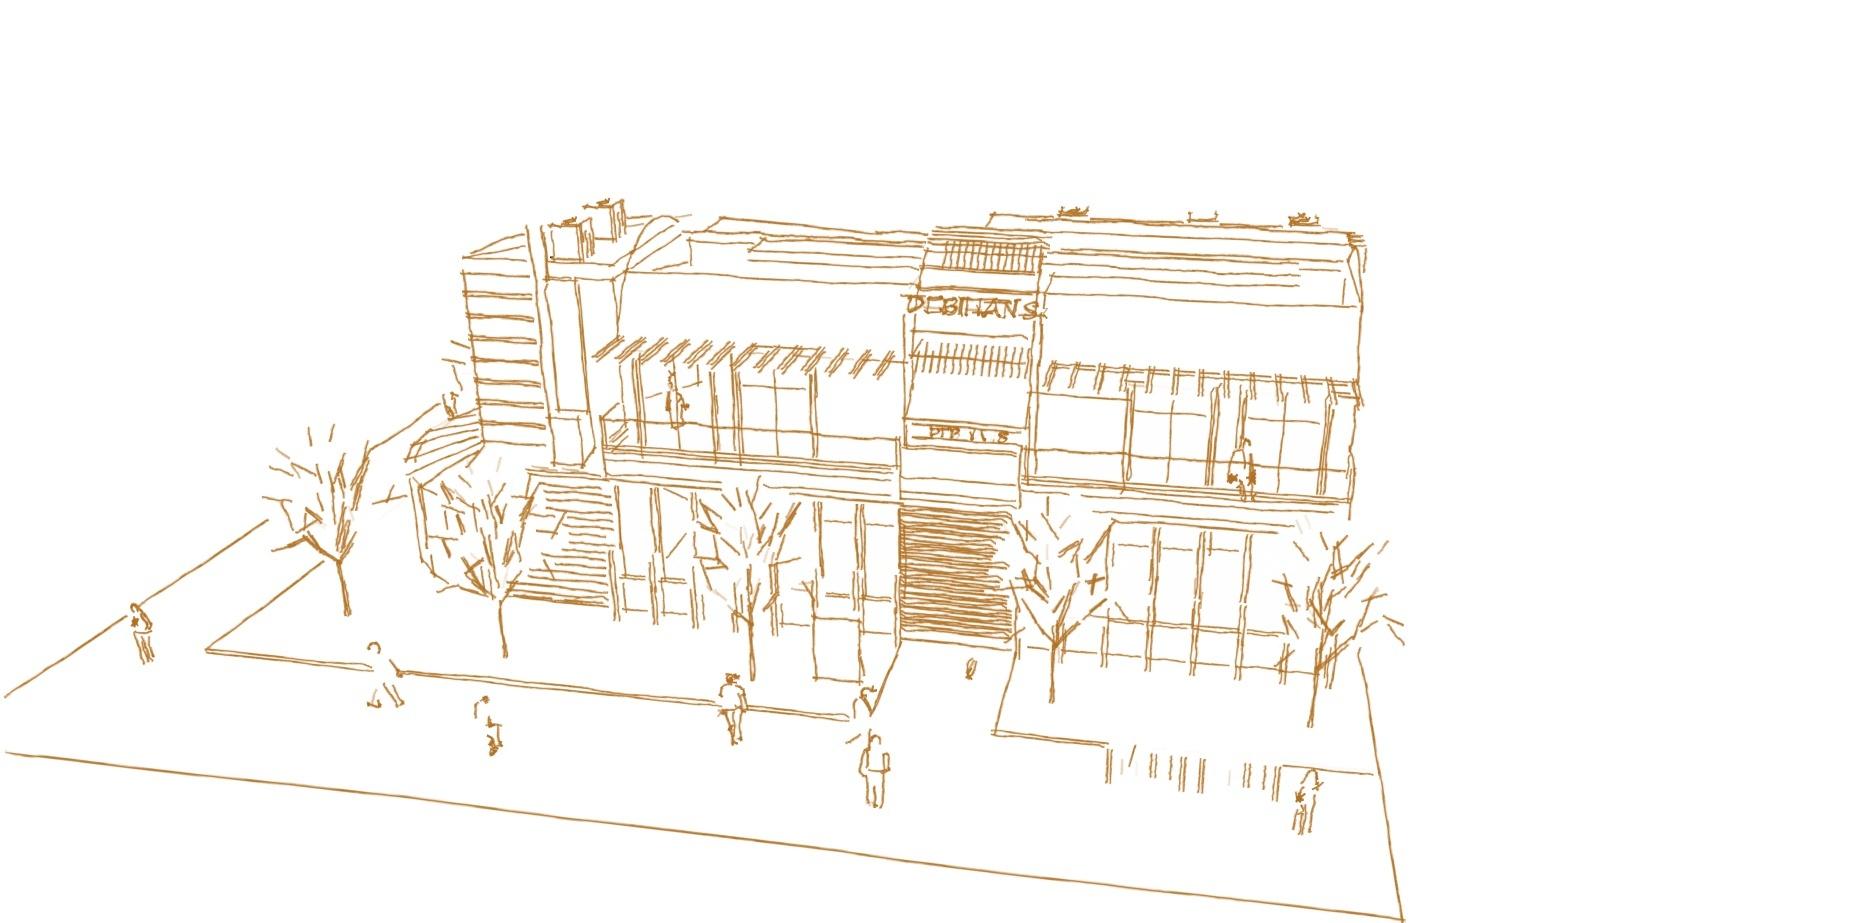 SketchUp'eur architecte -AnthO'- - Page 4 Debian11